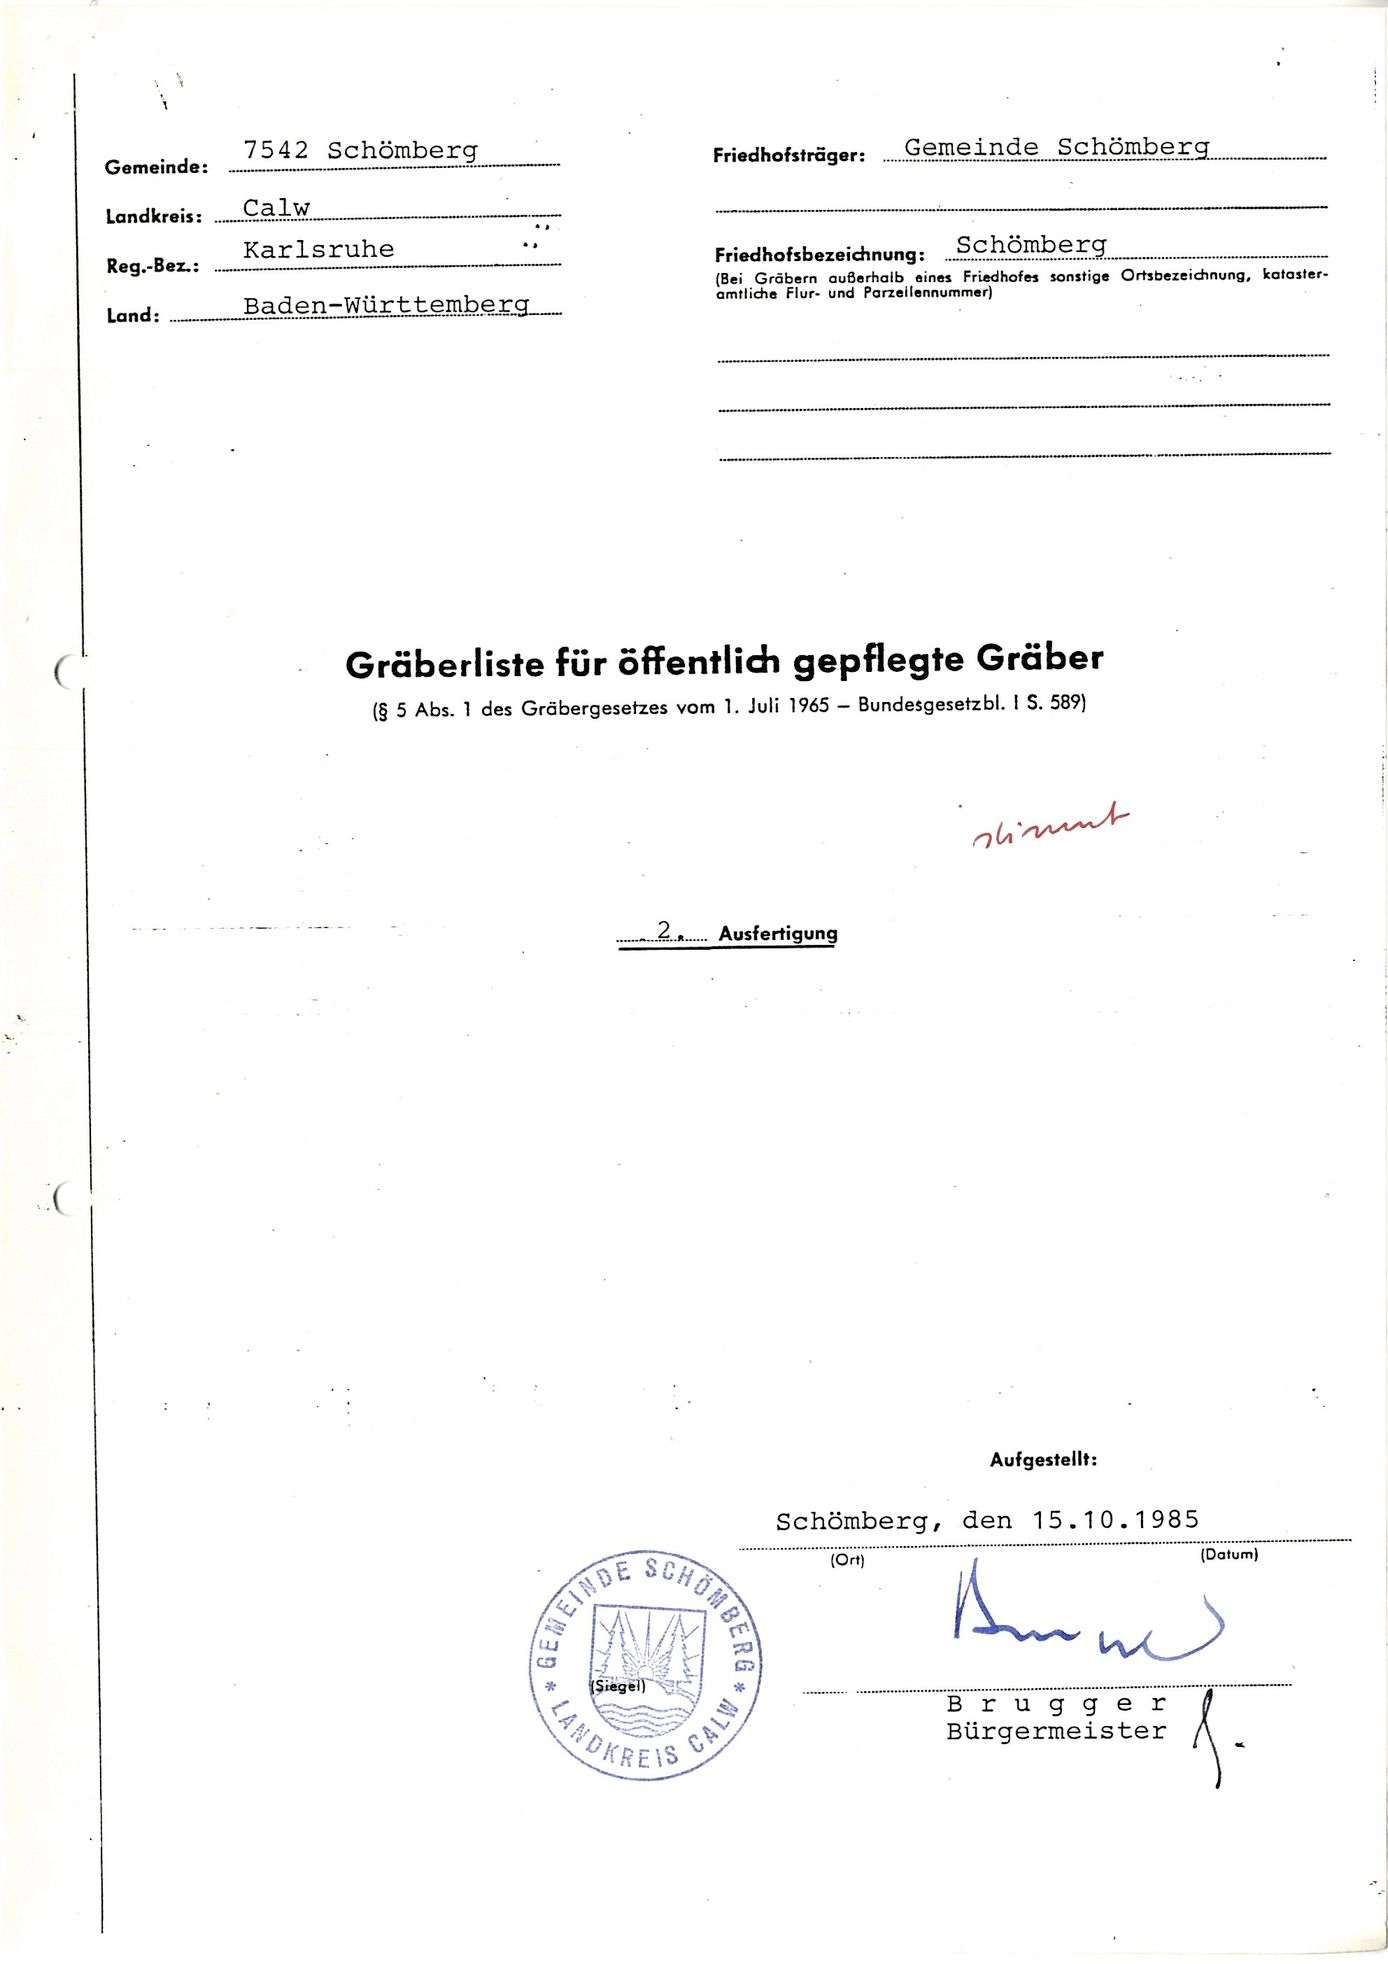 Schömberg, Bild 1